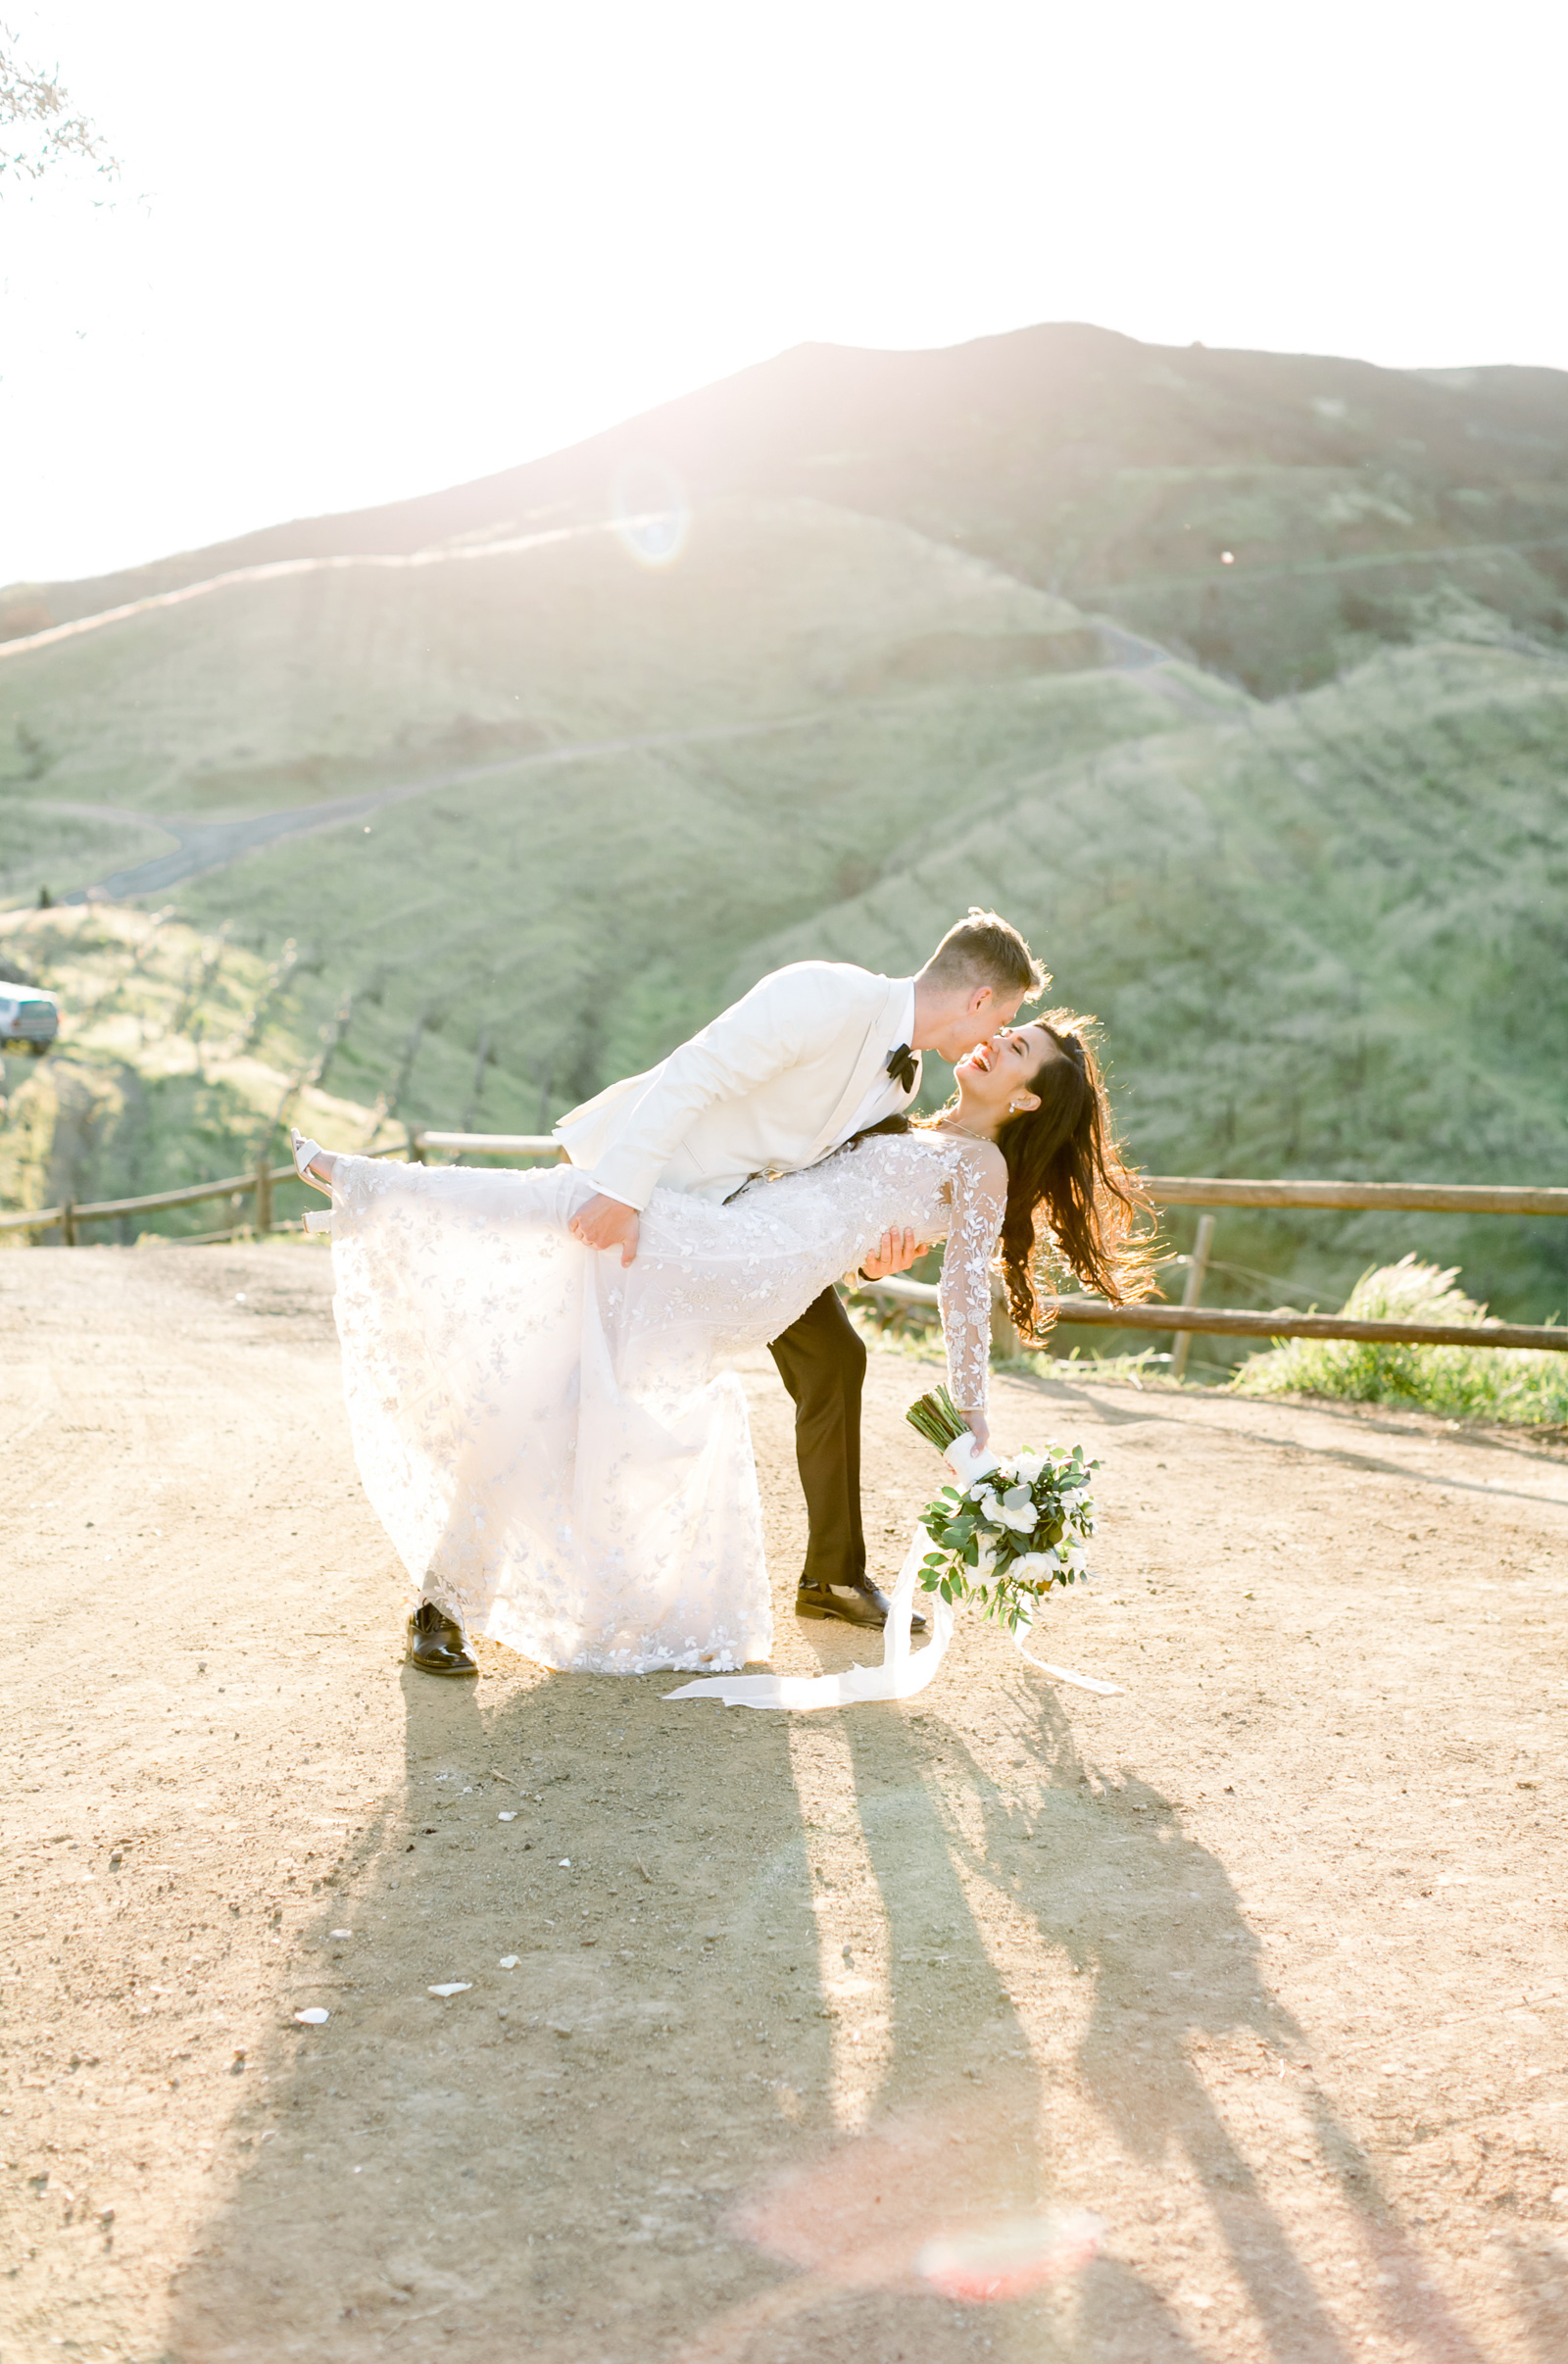 Style-Me-Pretty-Malibu-Wedding-Venues-Southern-California-Wedding-Photographer-Triunfo-Creek-Malibu-Photographer-Natalie-Schutt-Photography_04.jpg